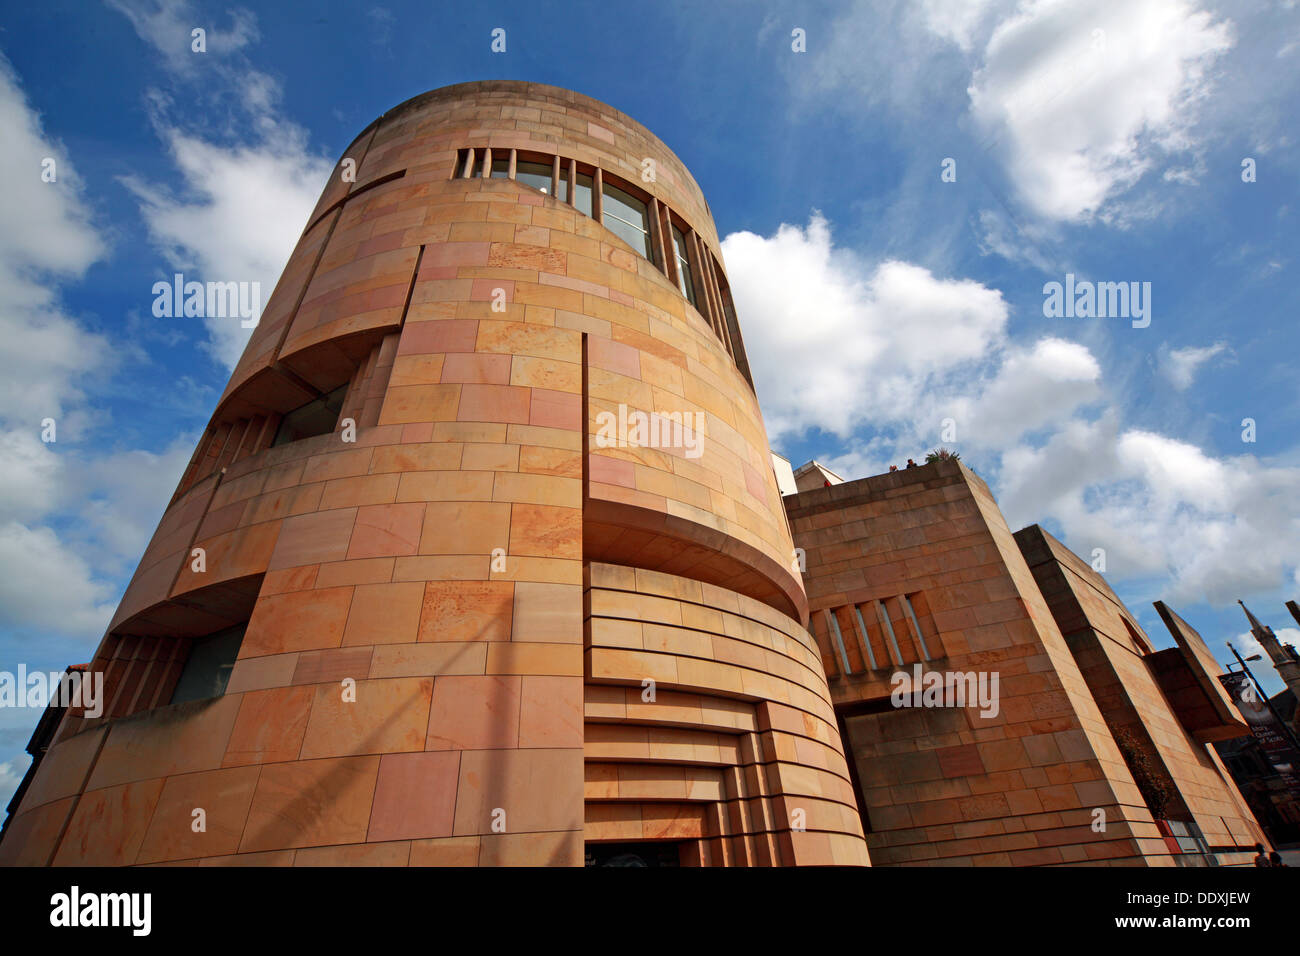 National Museum of Scotland new exterior with blue summer sky, Chambers St Edinburgh city, Scotland UK EH1 1JF Stock Photo